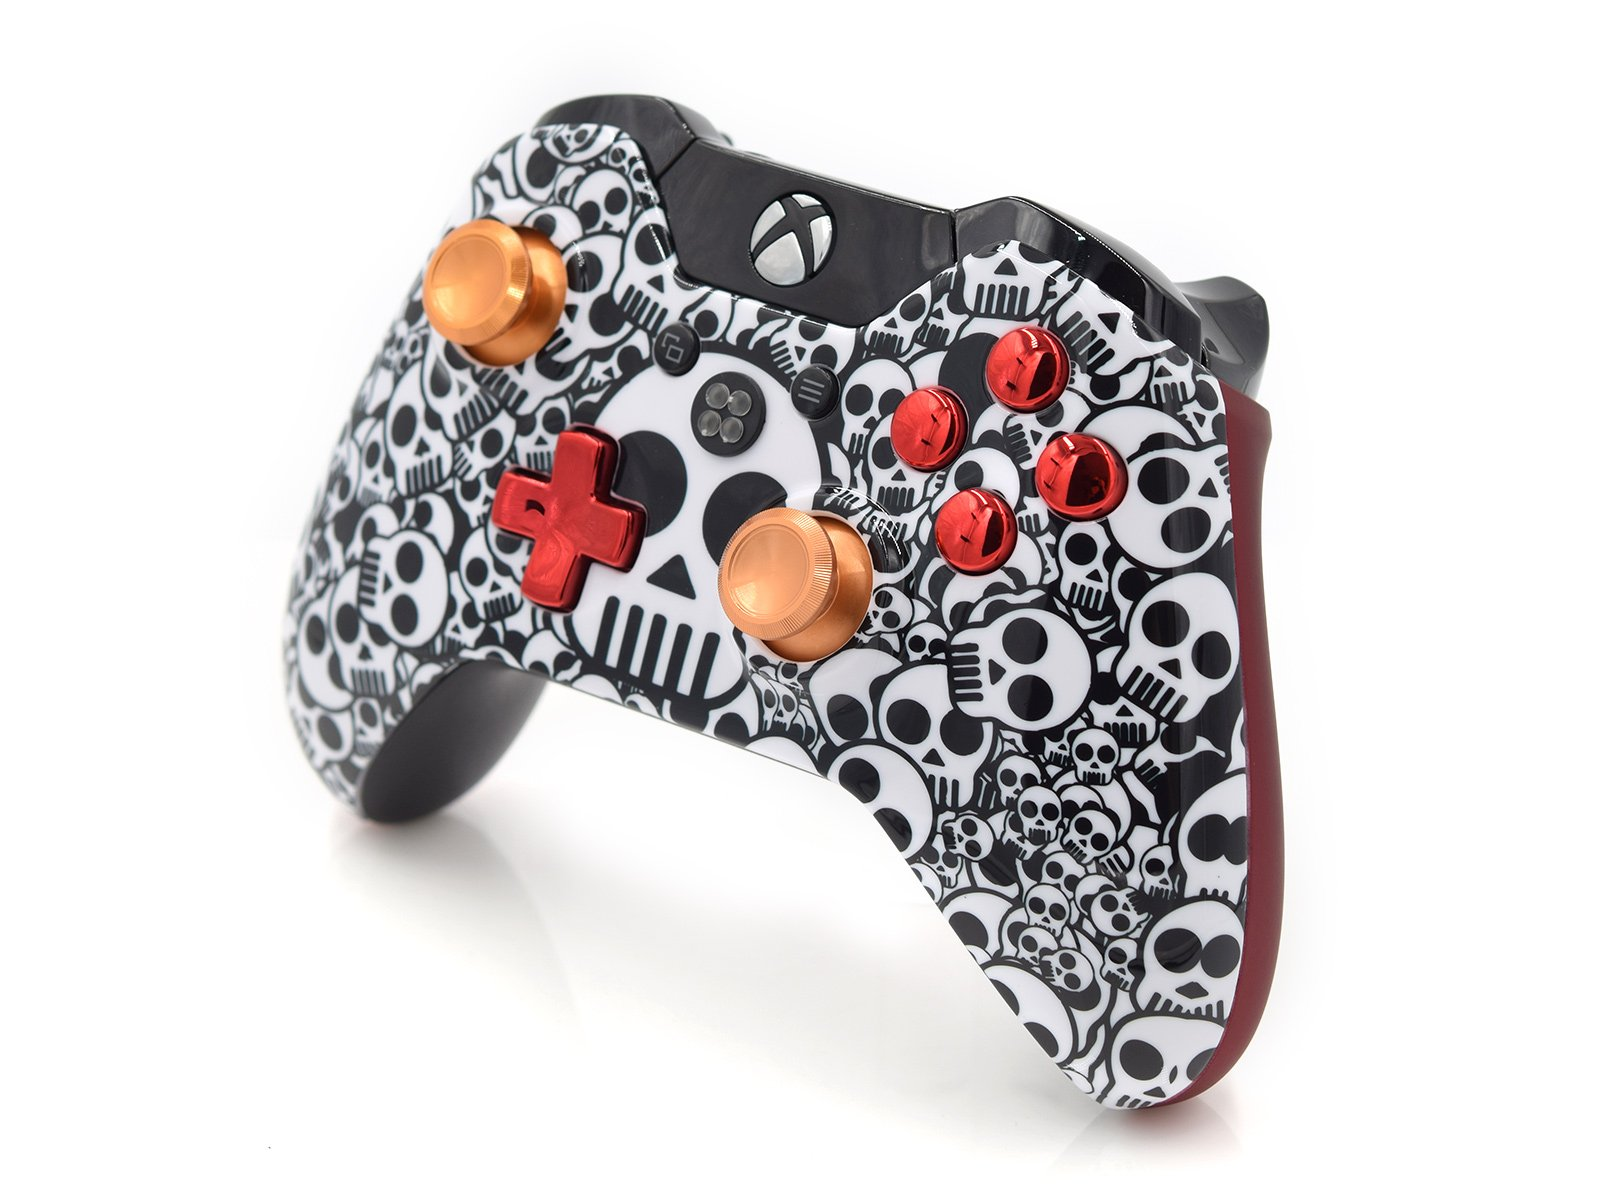 Xbox One Custom Controller - Hello Skully